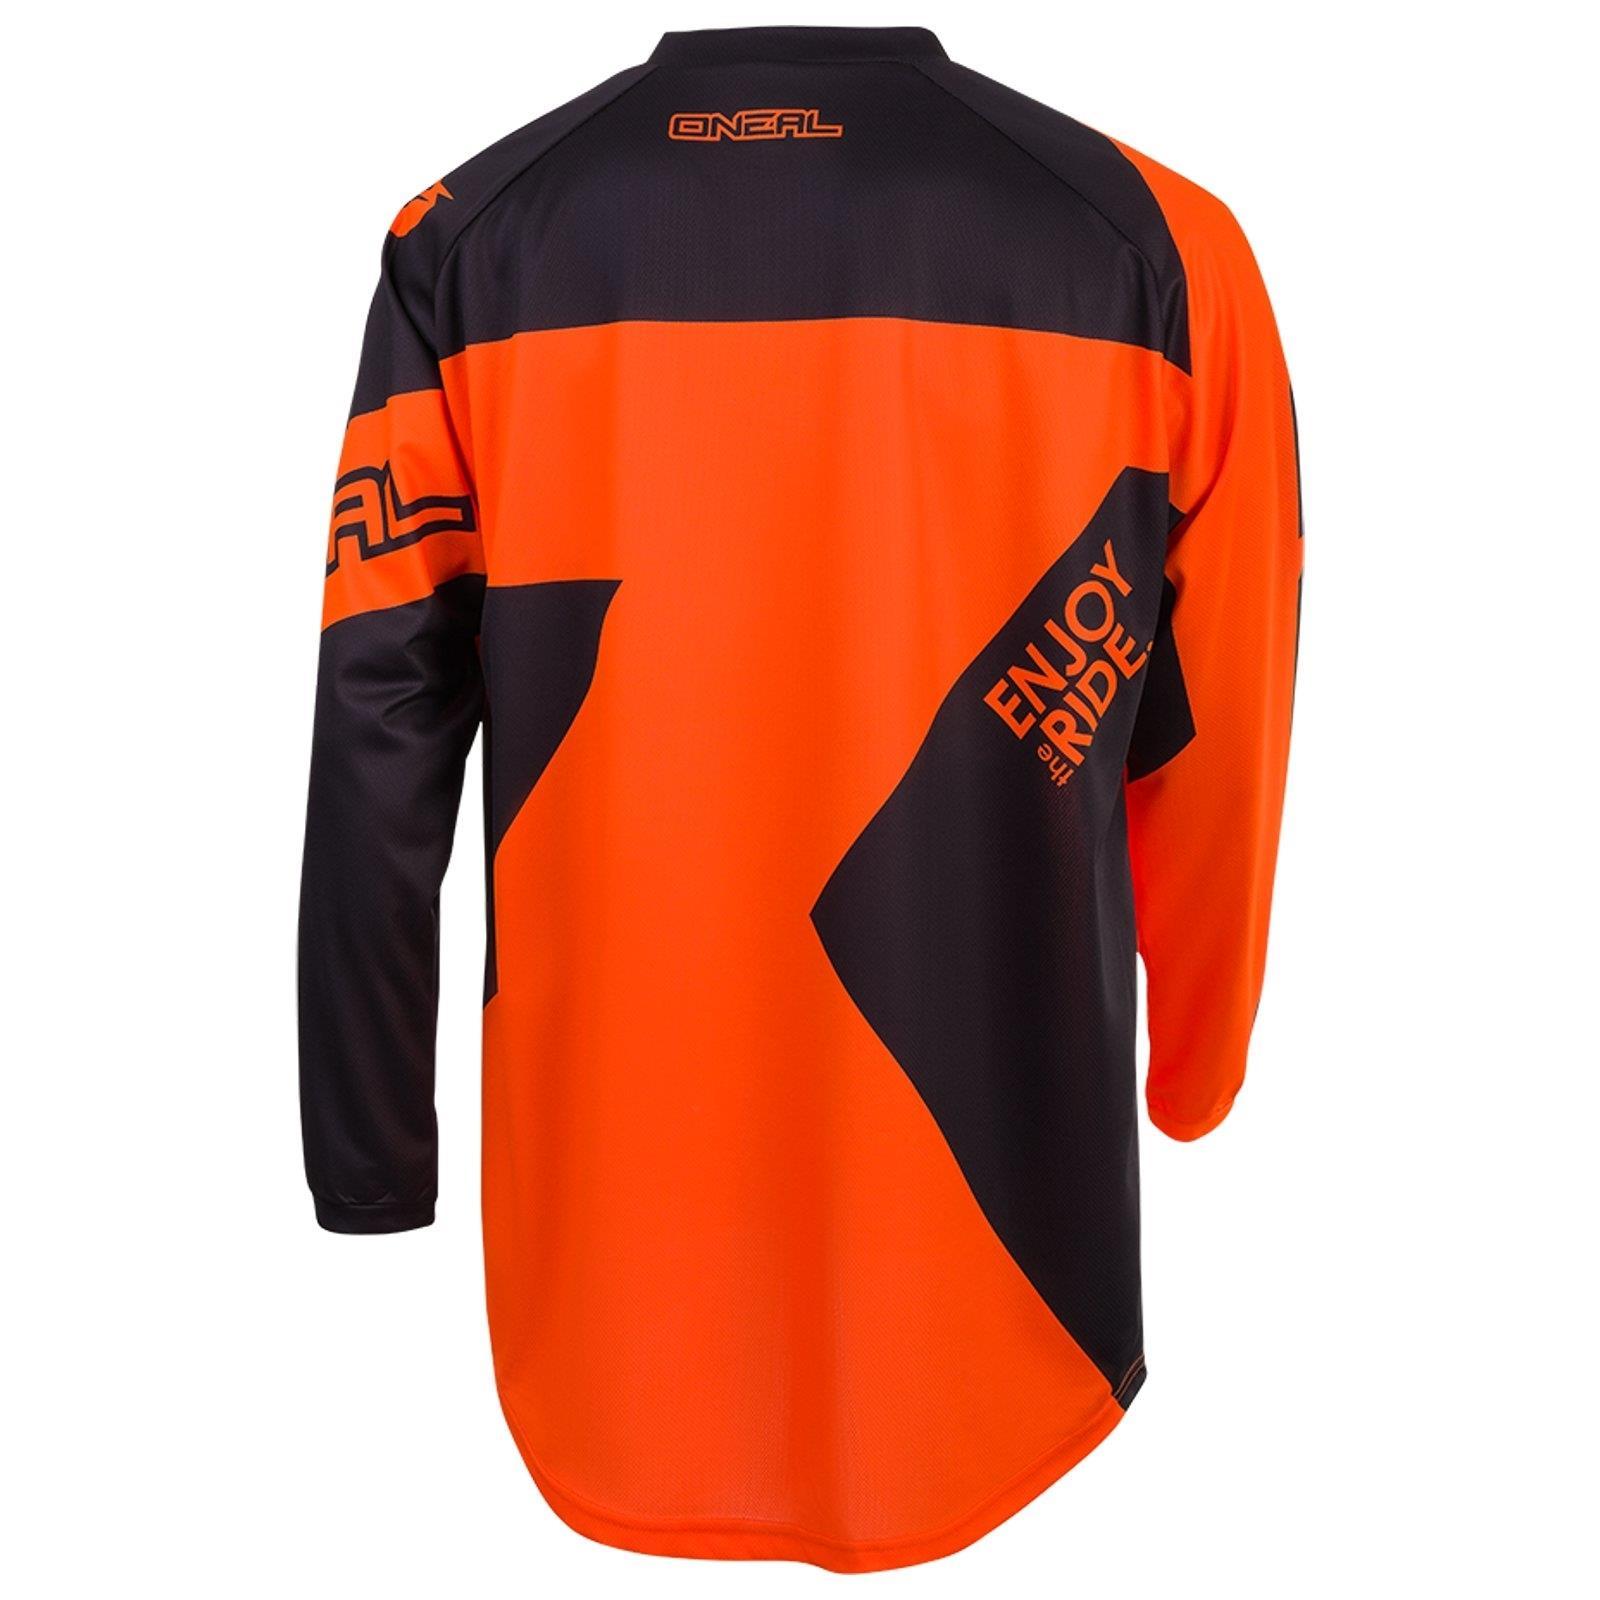 O-039-Neal-elemento-Mayhem-JERSEY-Racewear-Motocross-Maglia-MX-DH-FR-MTB-MOUNTAIN-BIKE miniatura 58